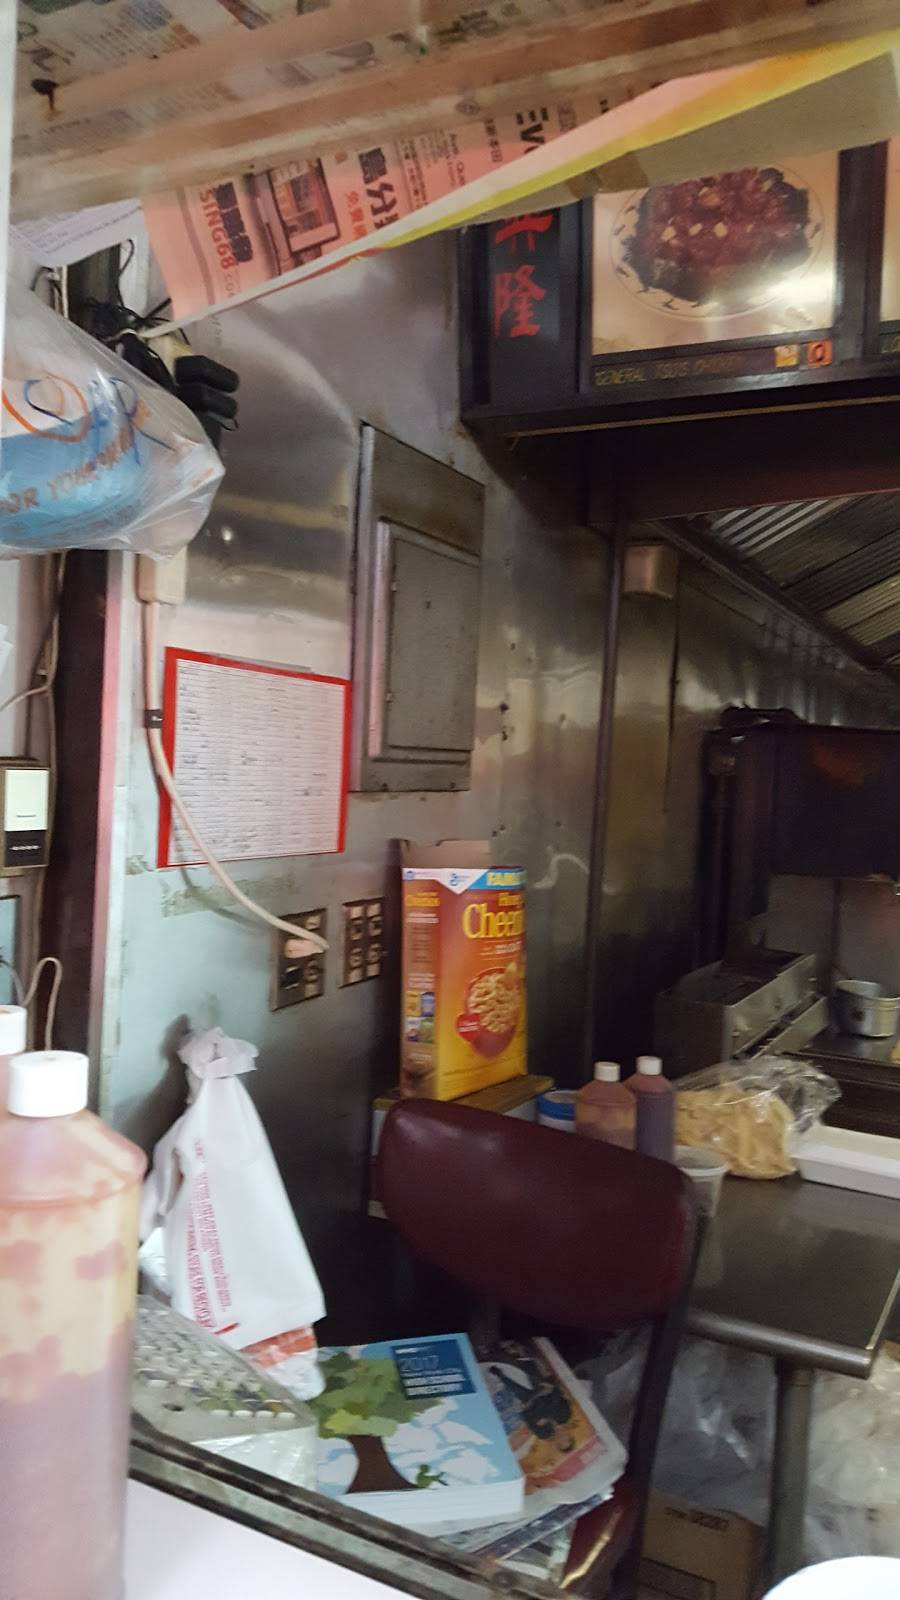 Fu Wing | restaurant | 153 E 106th St, New York, NY 10029, USA | 2129875329 OR +1 212-987-5329